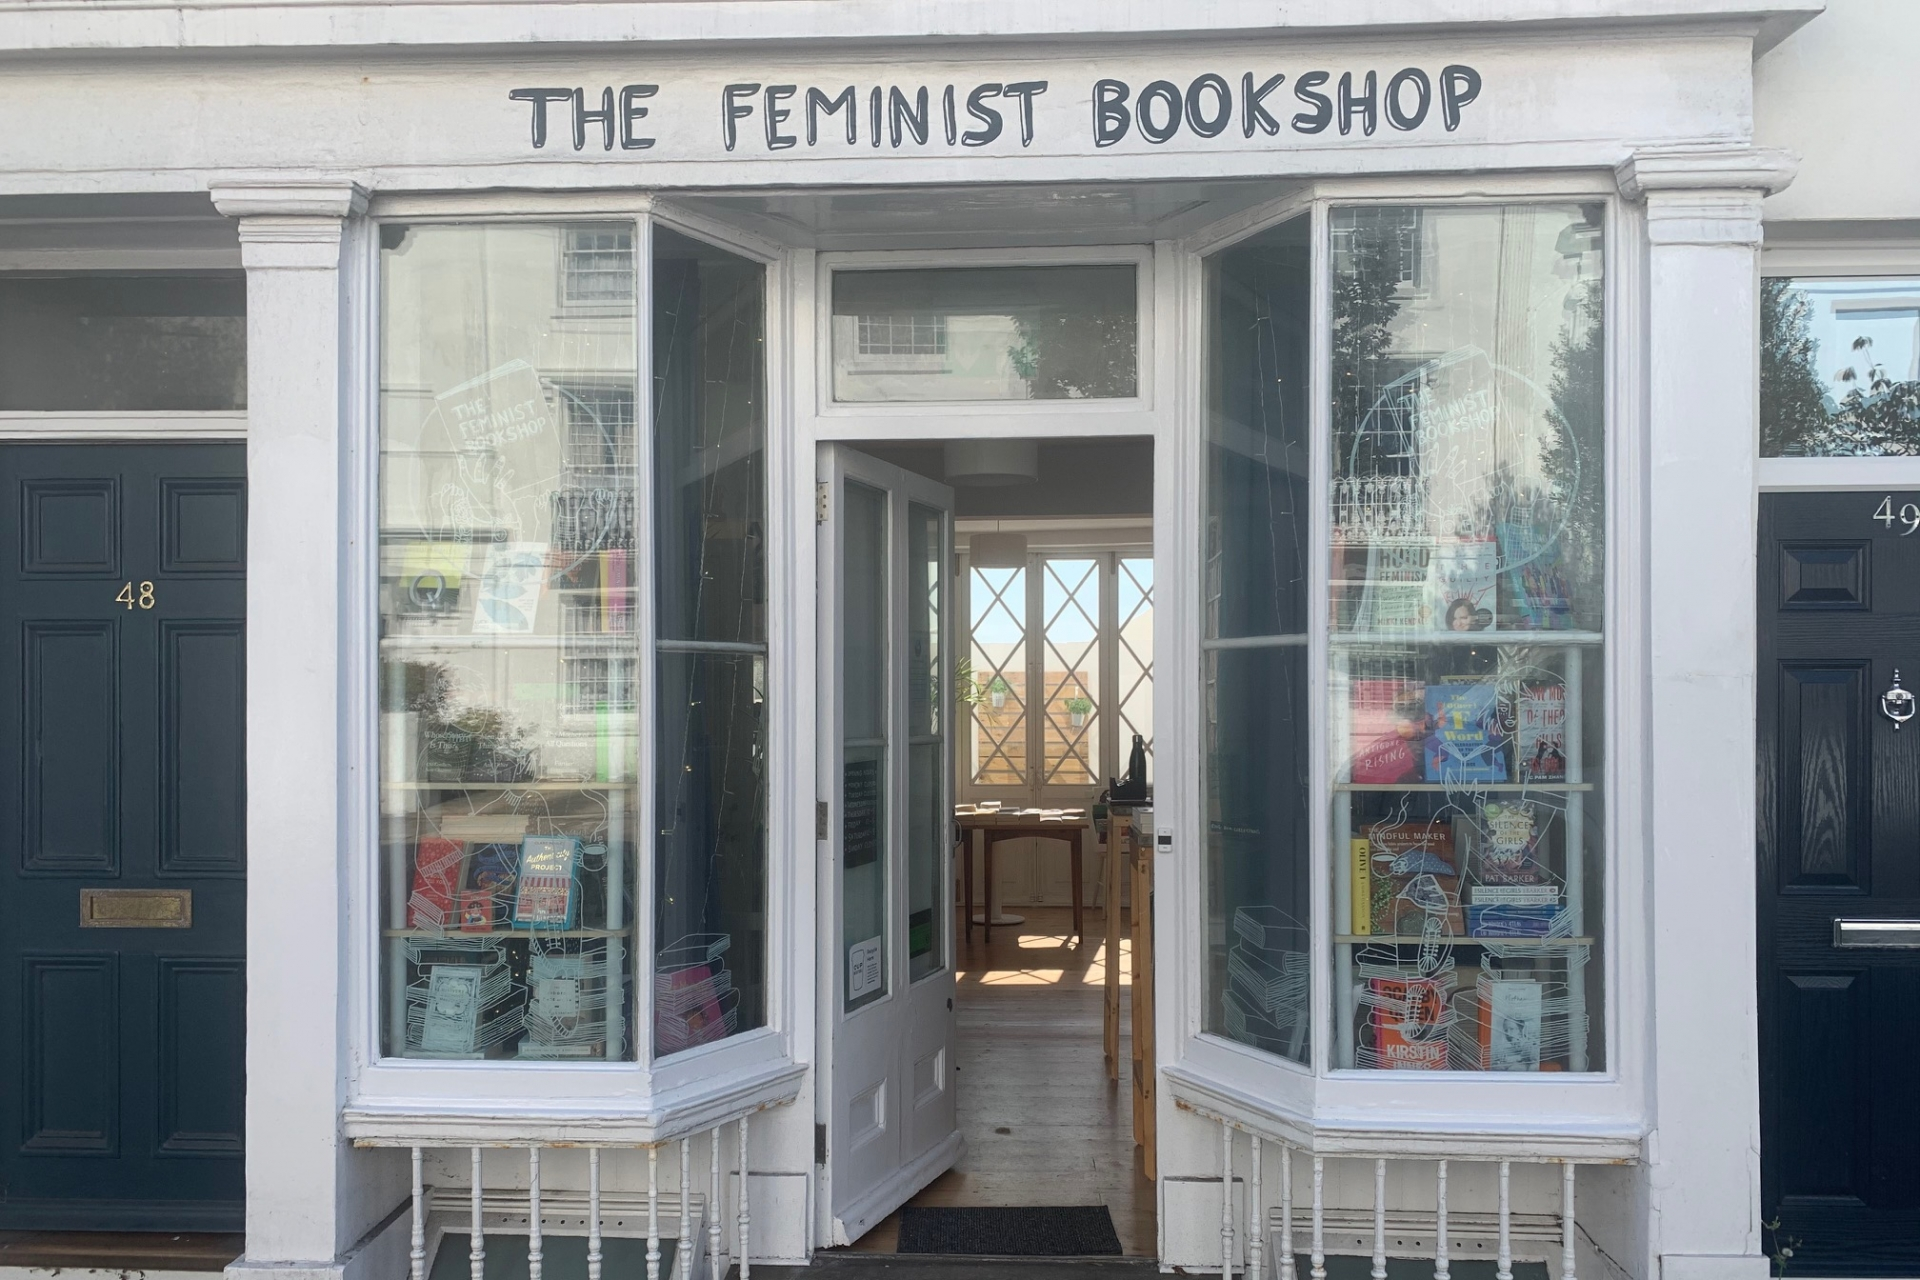 LoveReading Bookshop Feature: The Feminist Bookshop (Brighton)